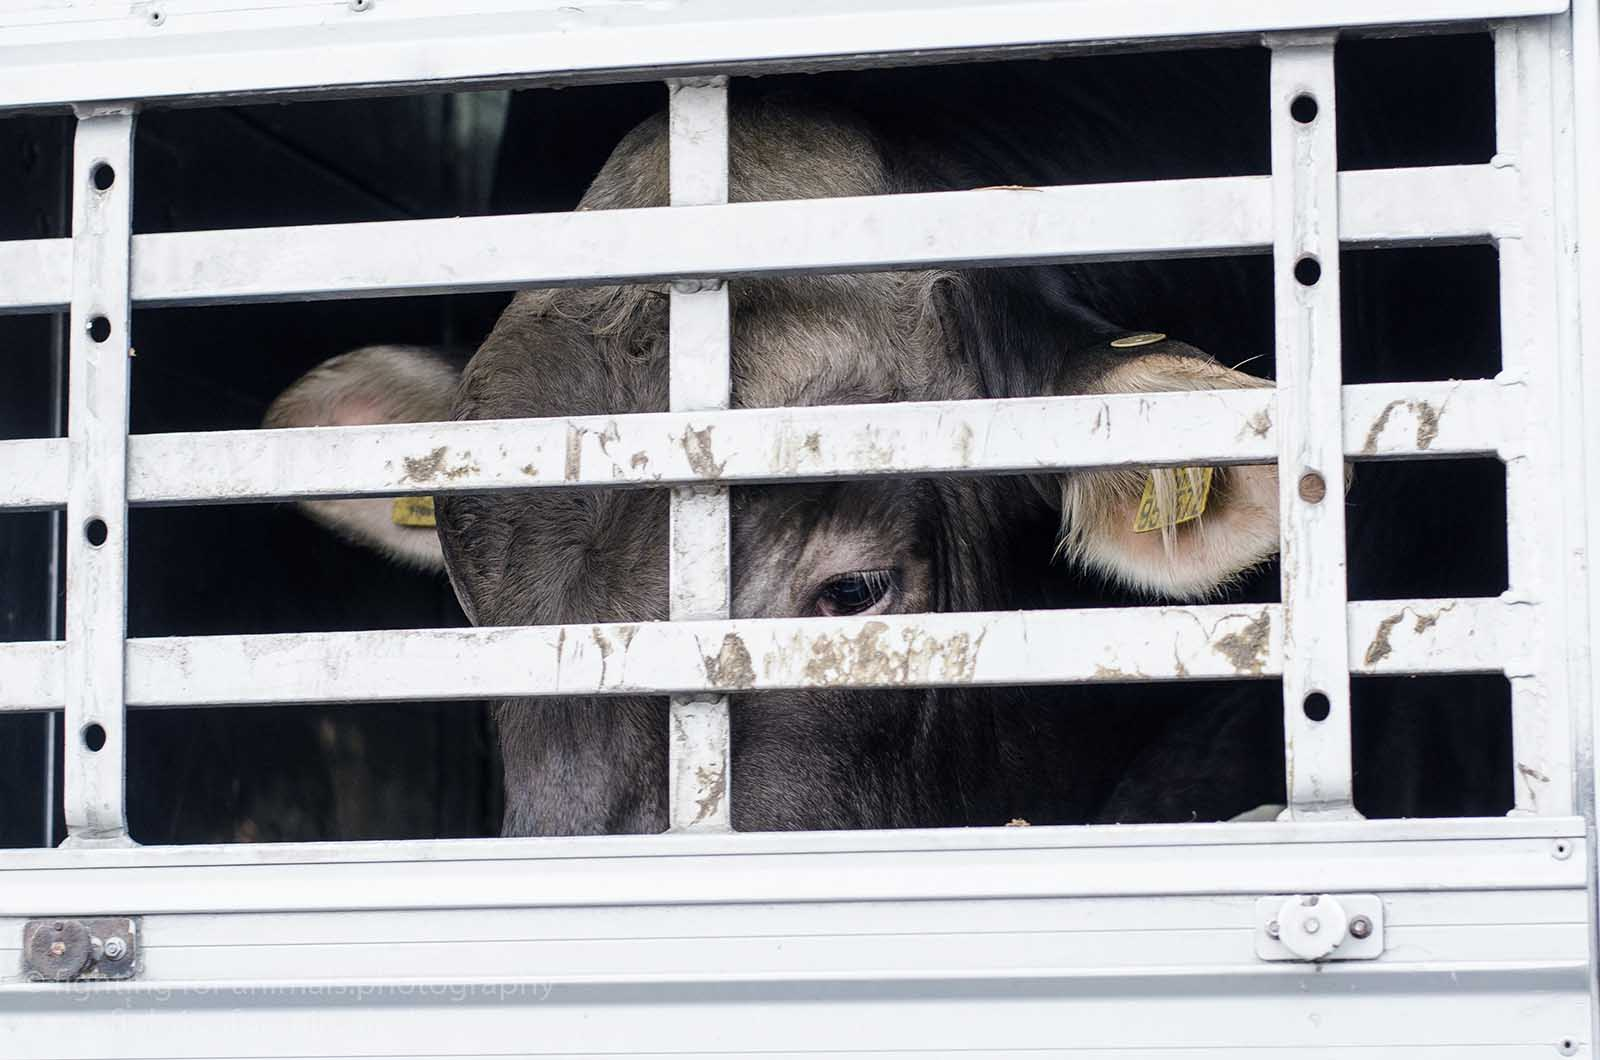 Jetzt tut sich was: Erste Veterinärämter stoppen Tiertransporte